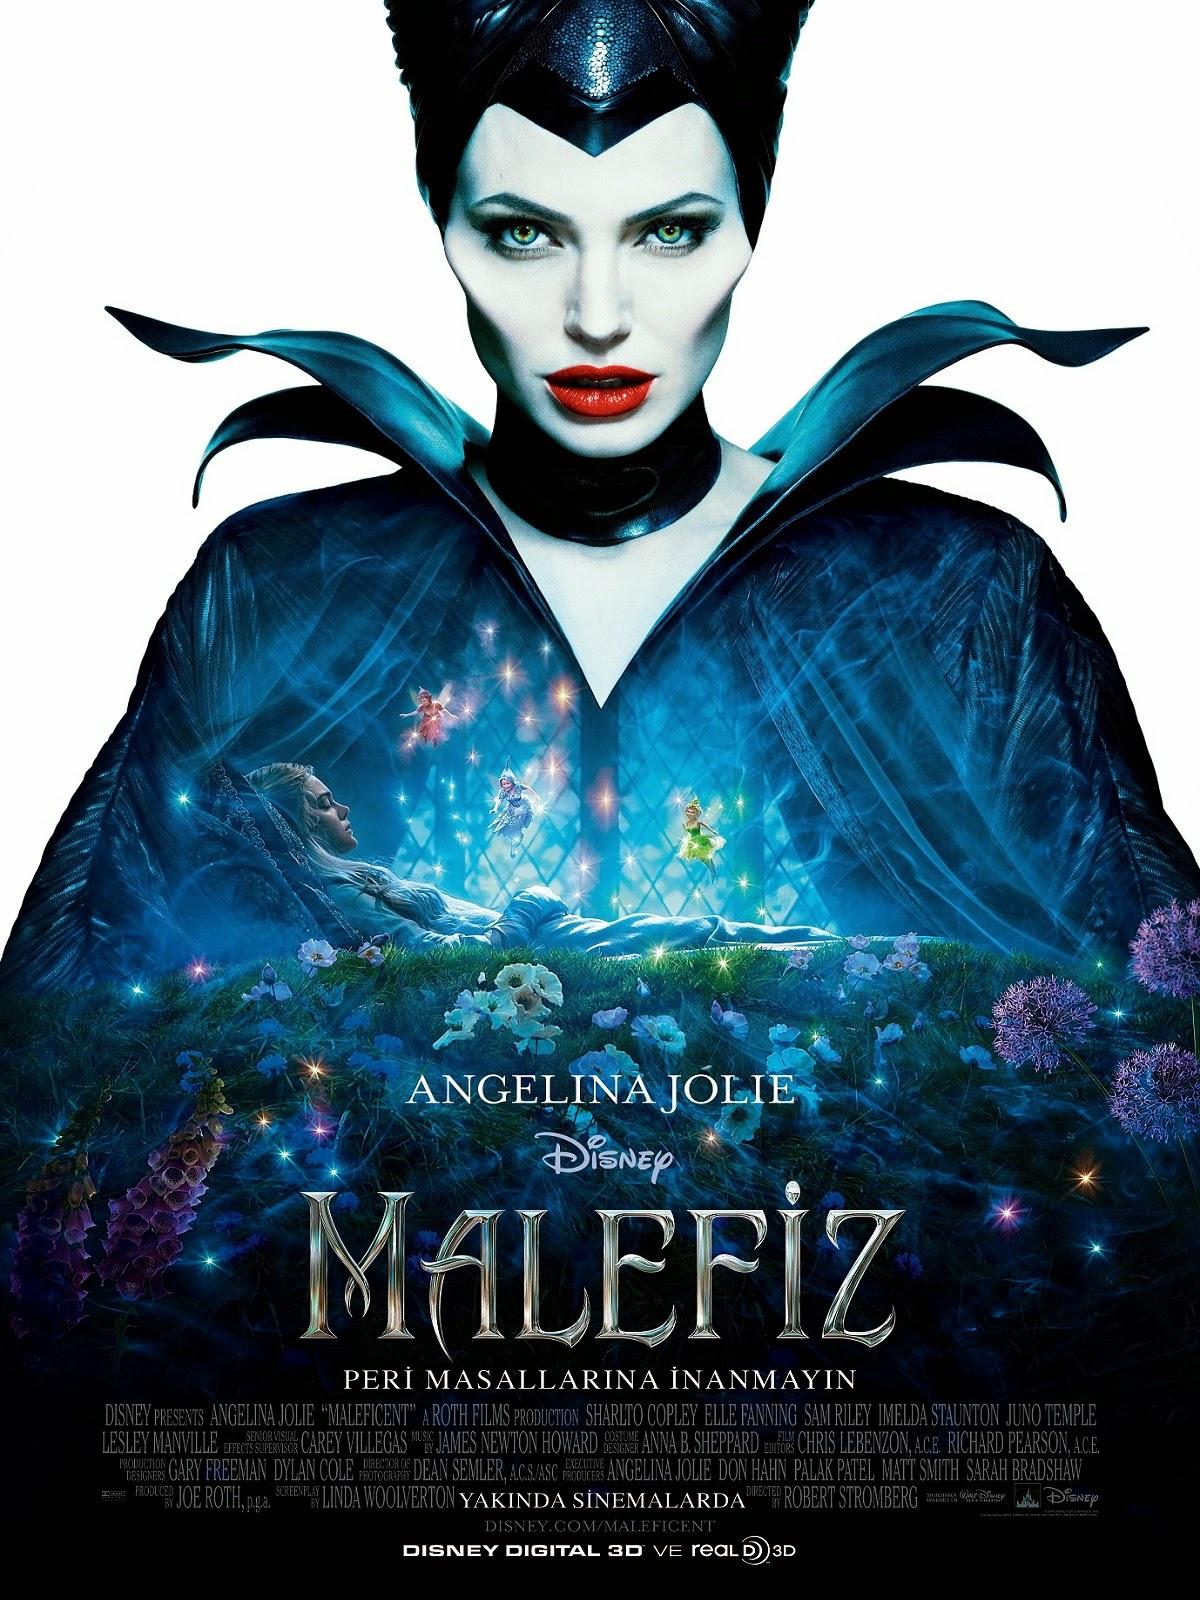 Malefiz - Maleficent (2014)